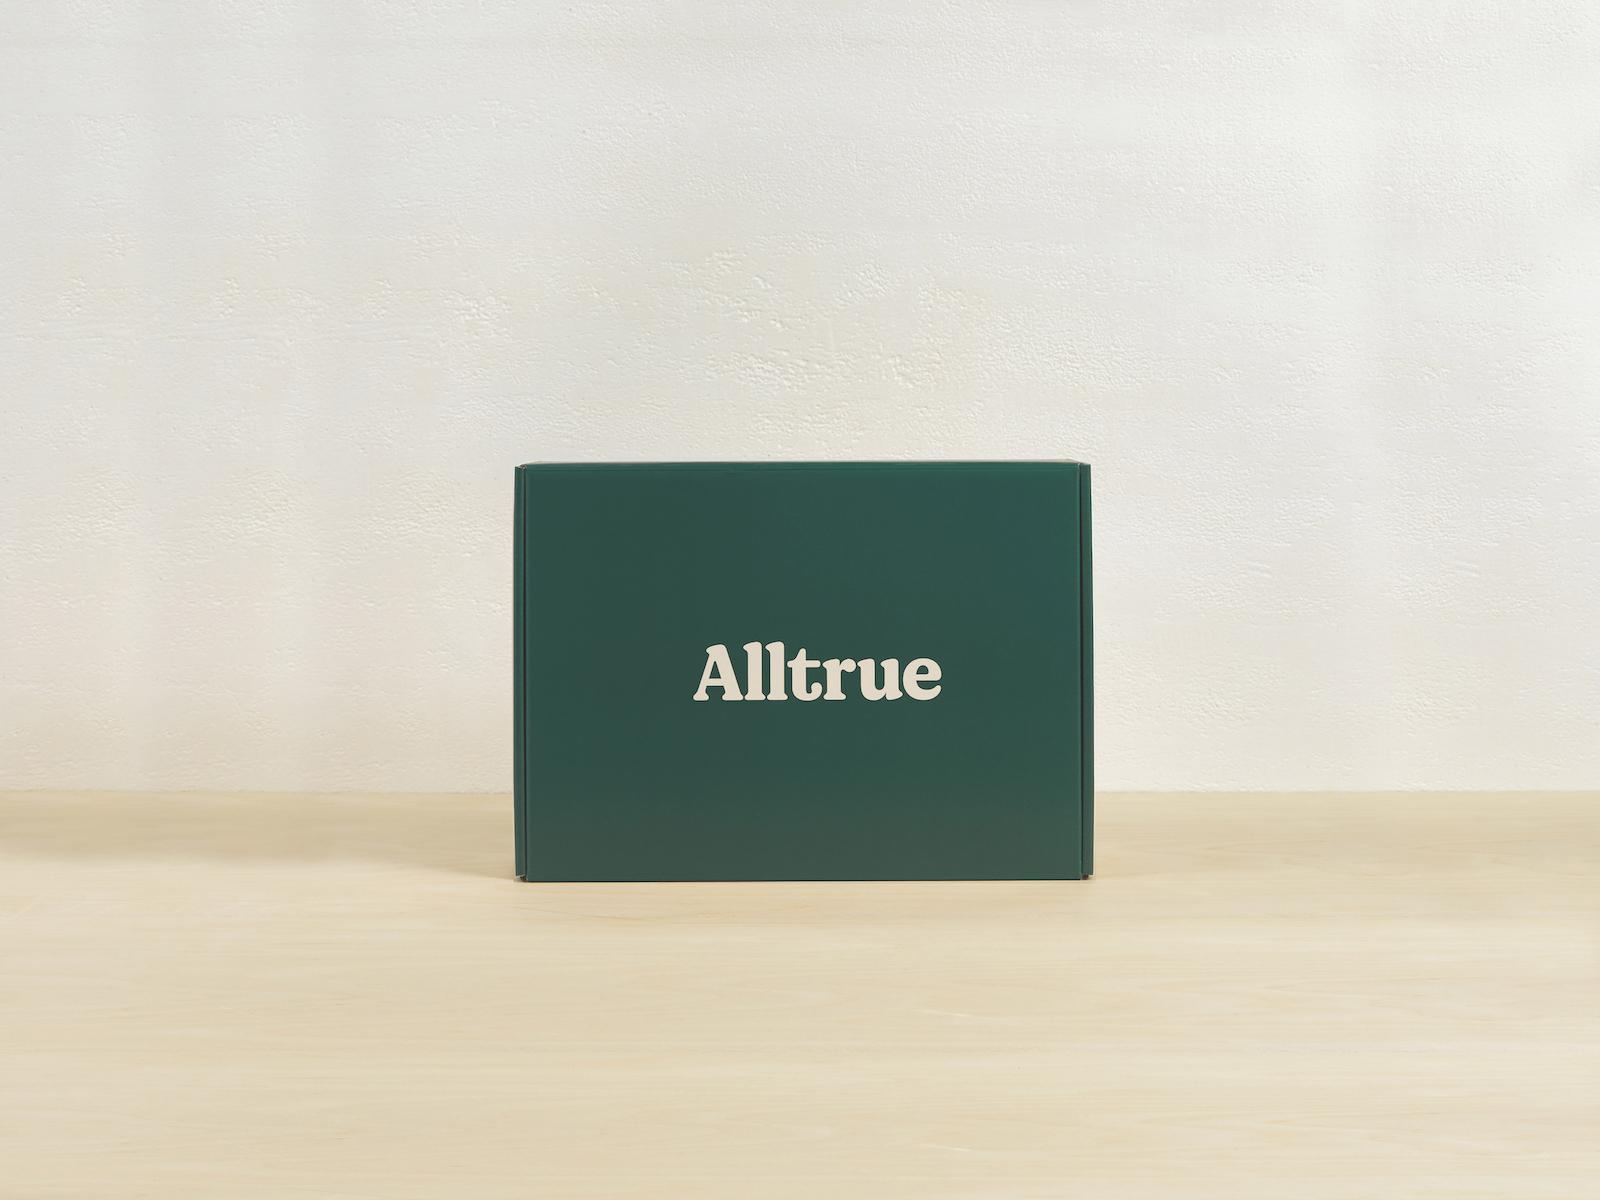 Alltrue Box photo evergreen design